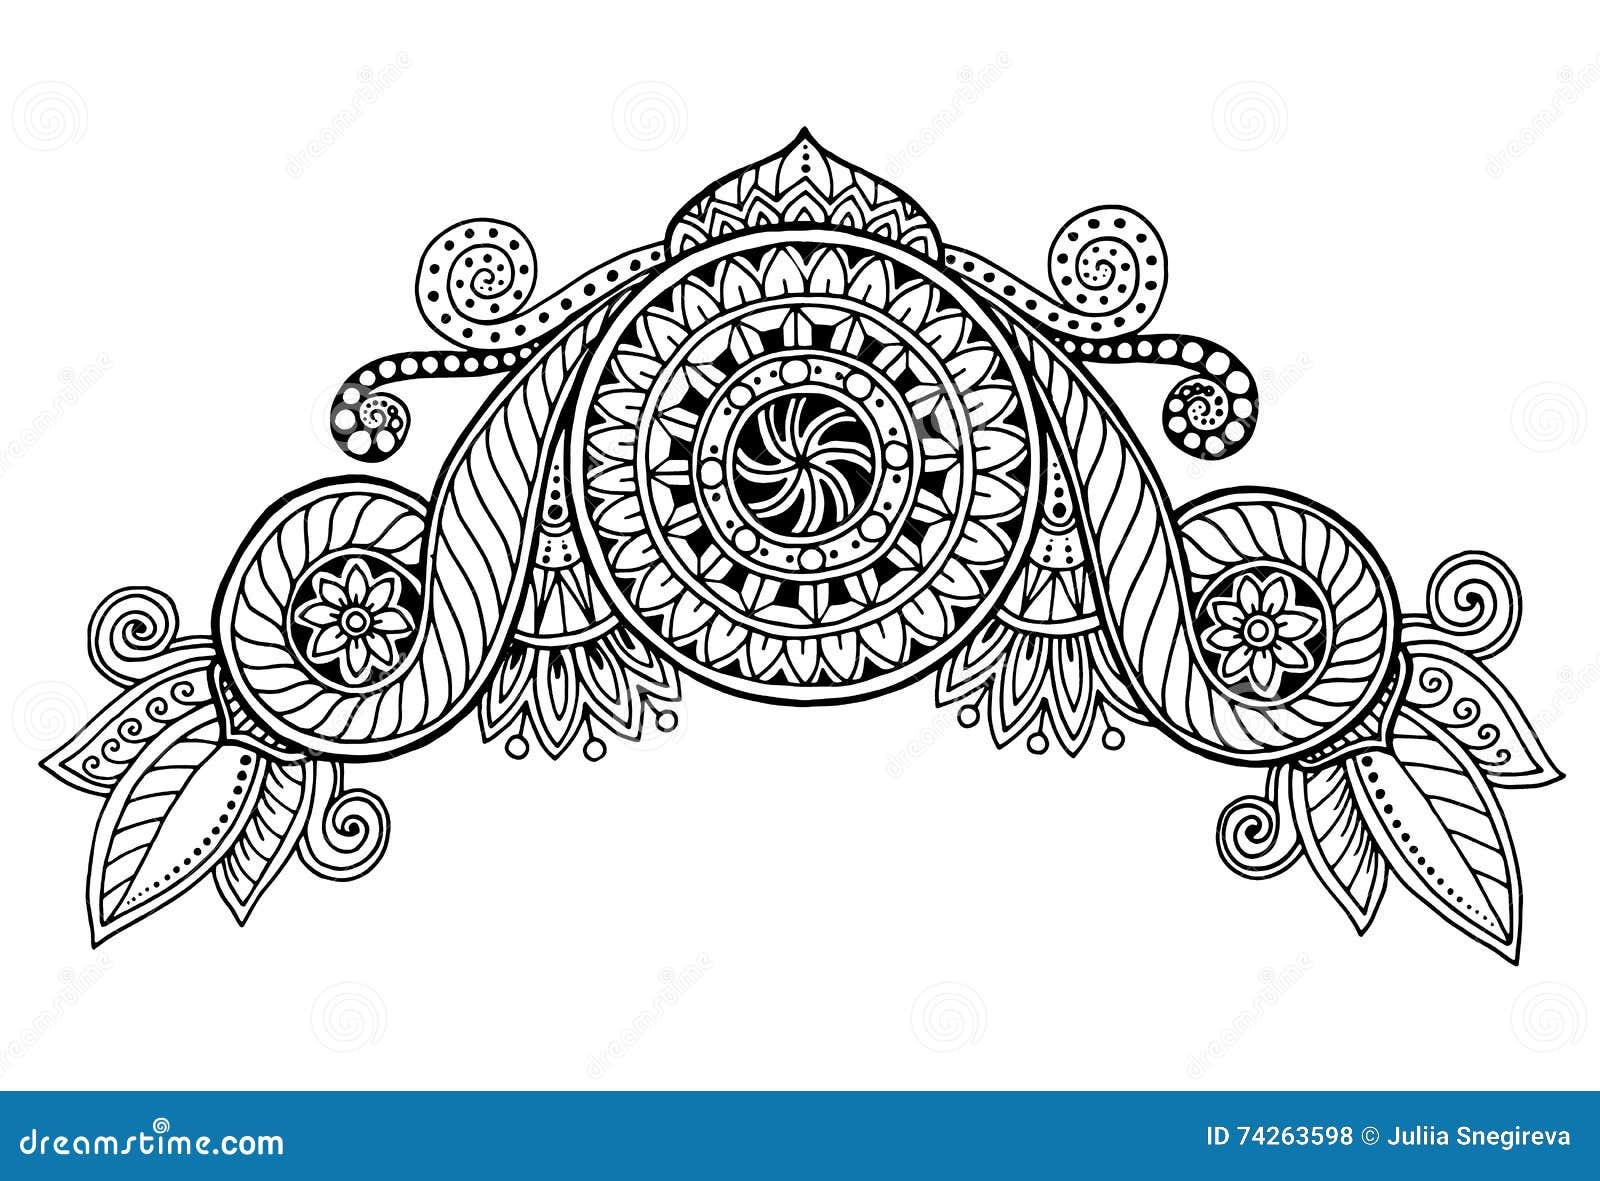 Henna Paisley Mehndi Doodles Design Tribal Design Element